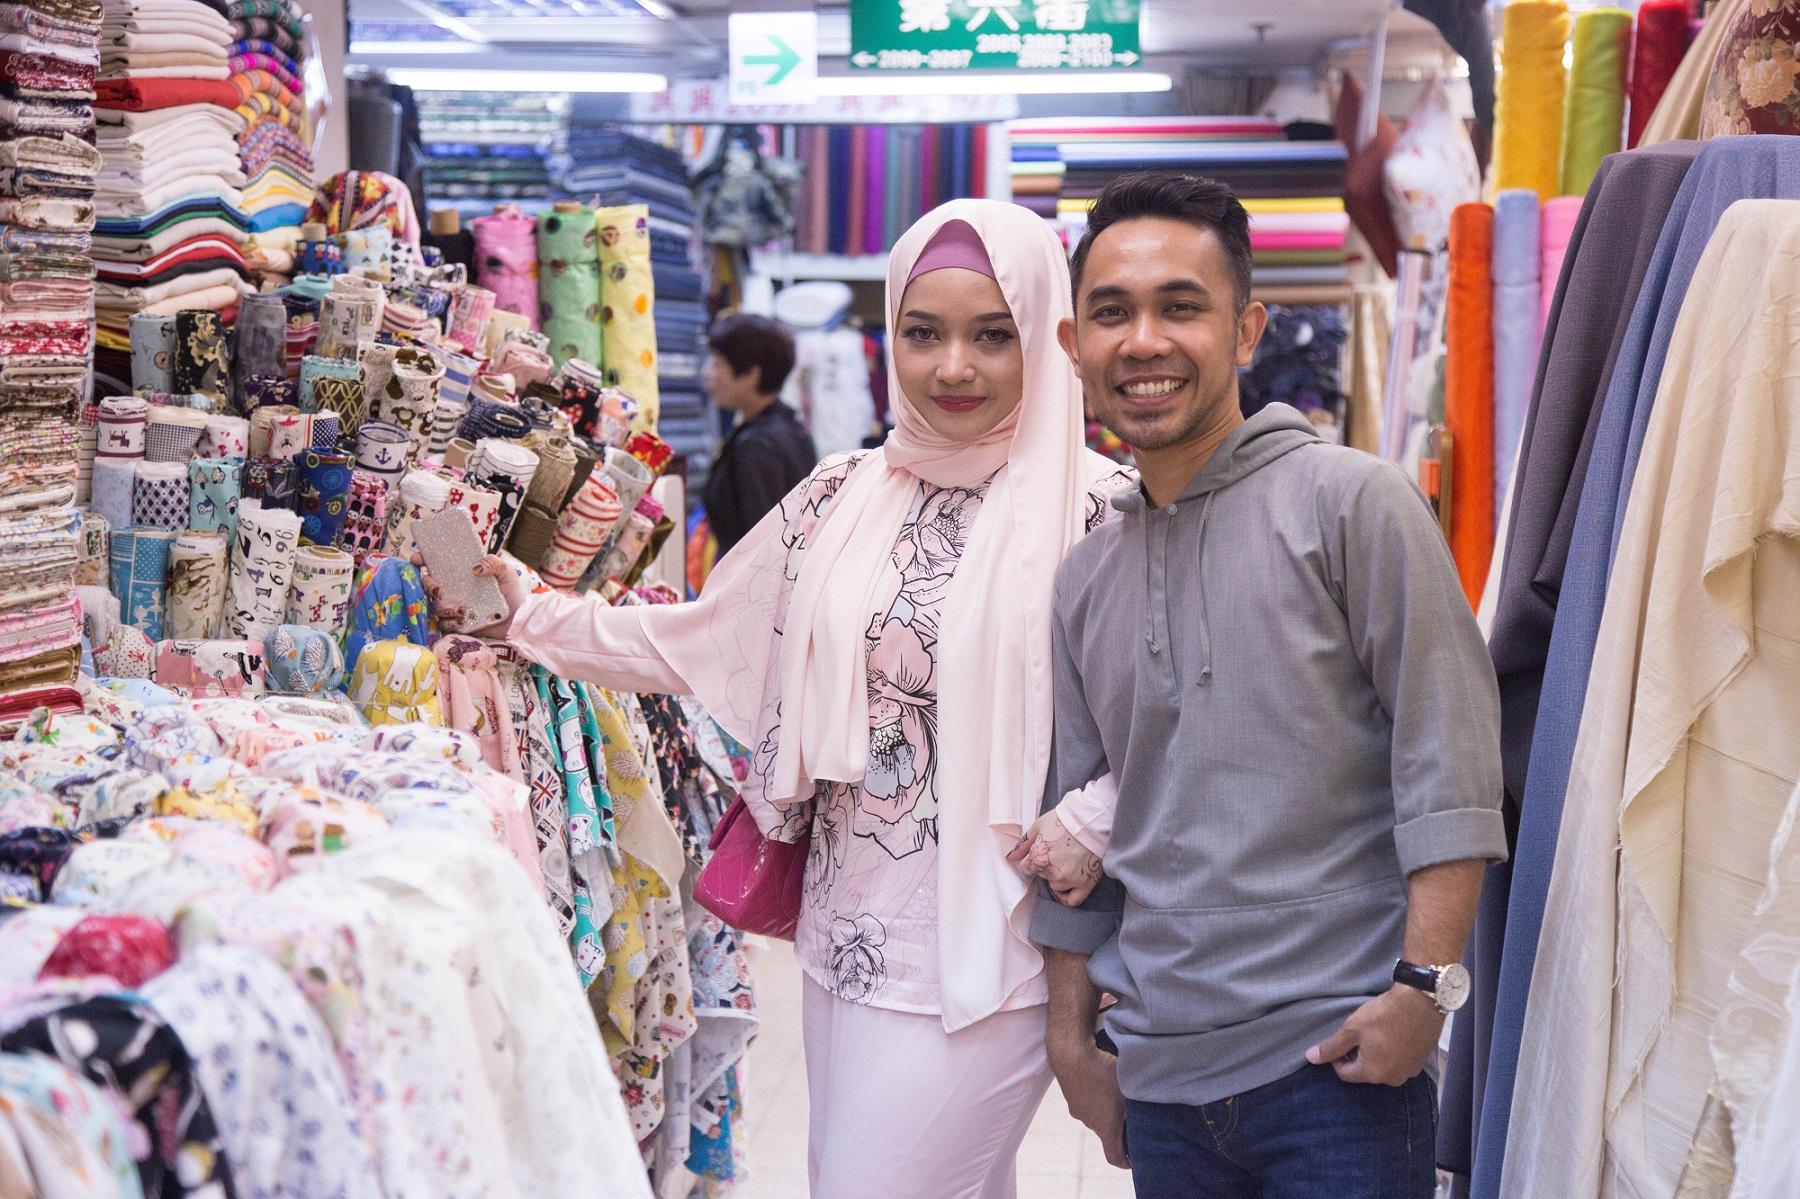 Hafiz夫婦走訪大稻埕及永樂市場,表示台北街頭乾淨又漂亮、民眾友善又熱情